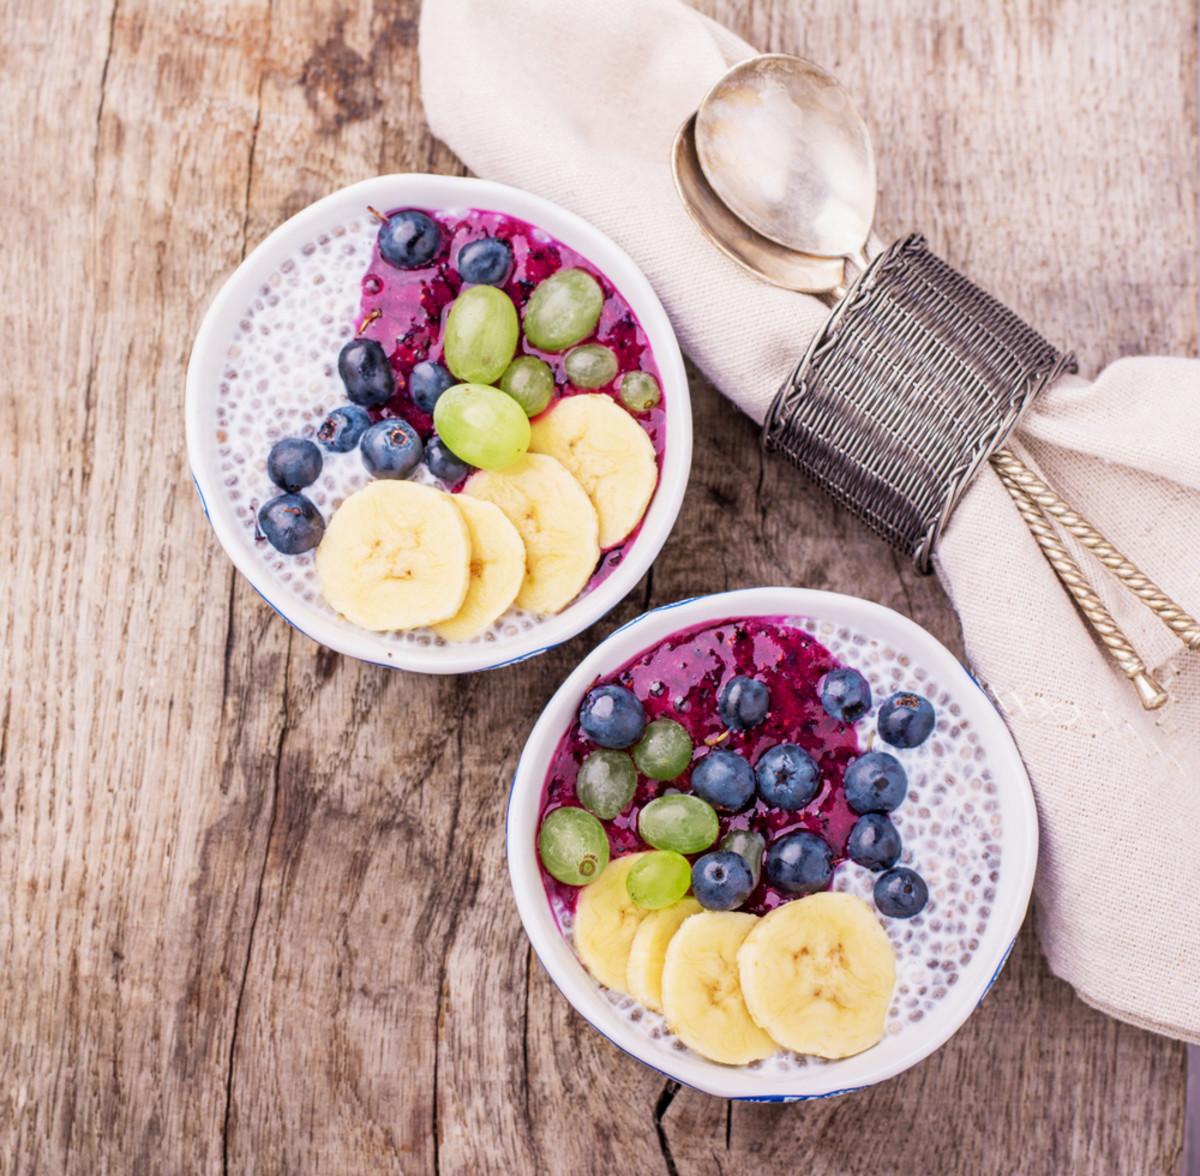 31 Vegan Breakfast Recipes That'll Make You Happy You're